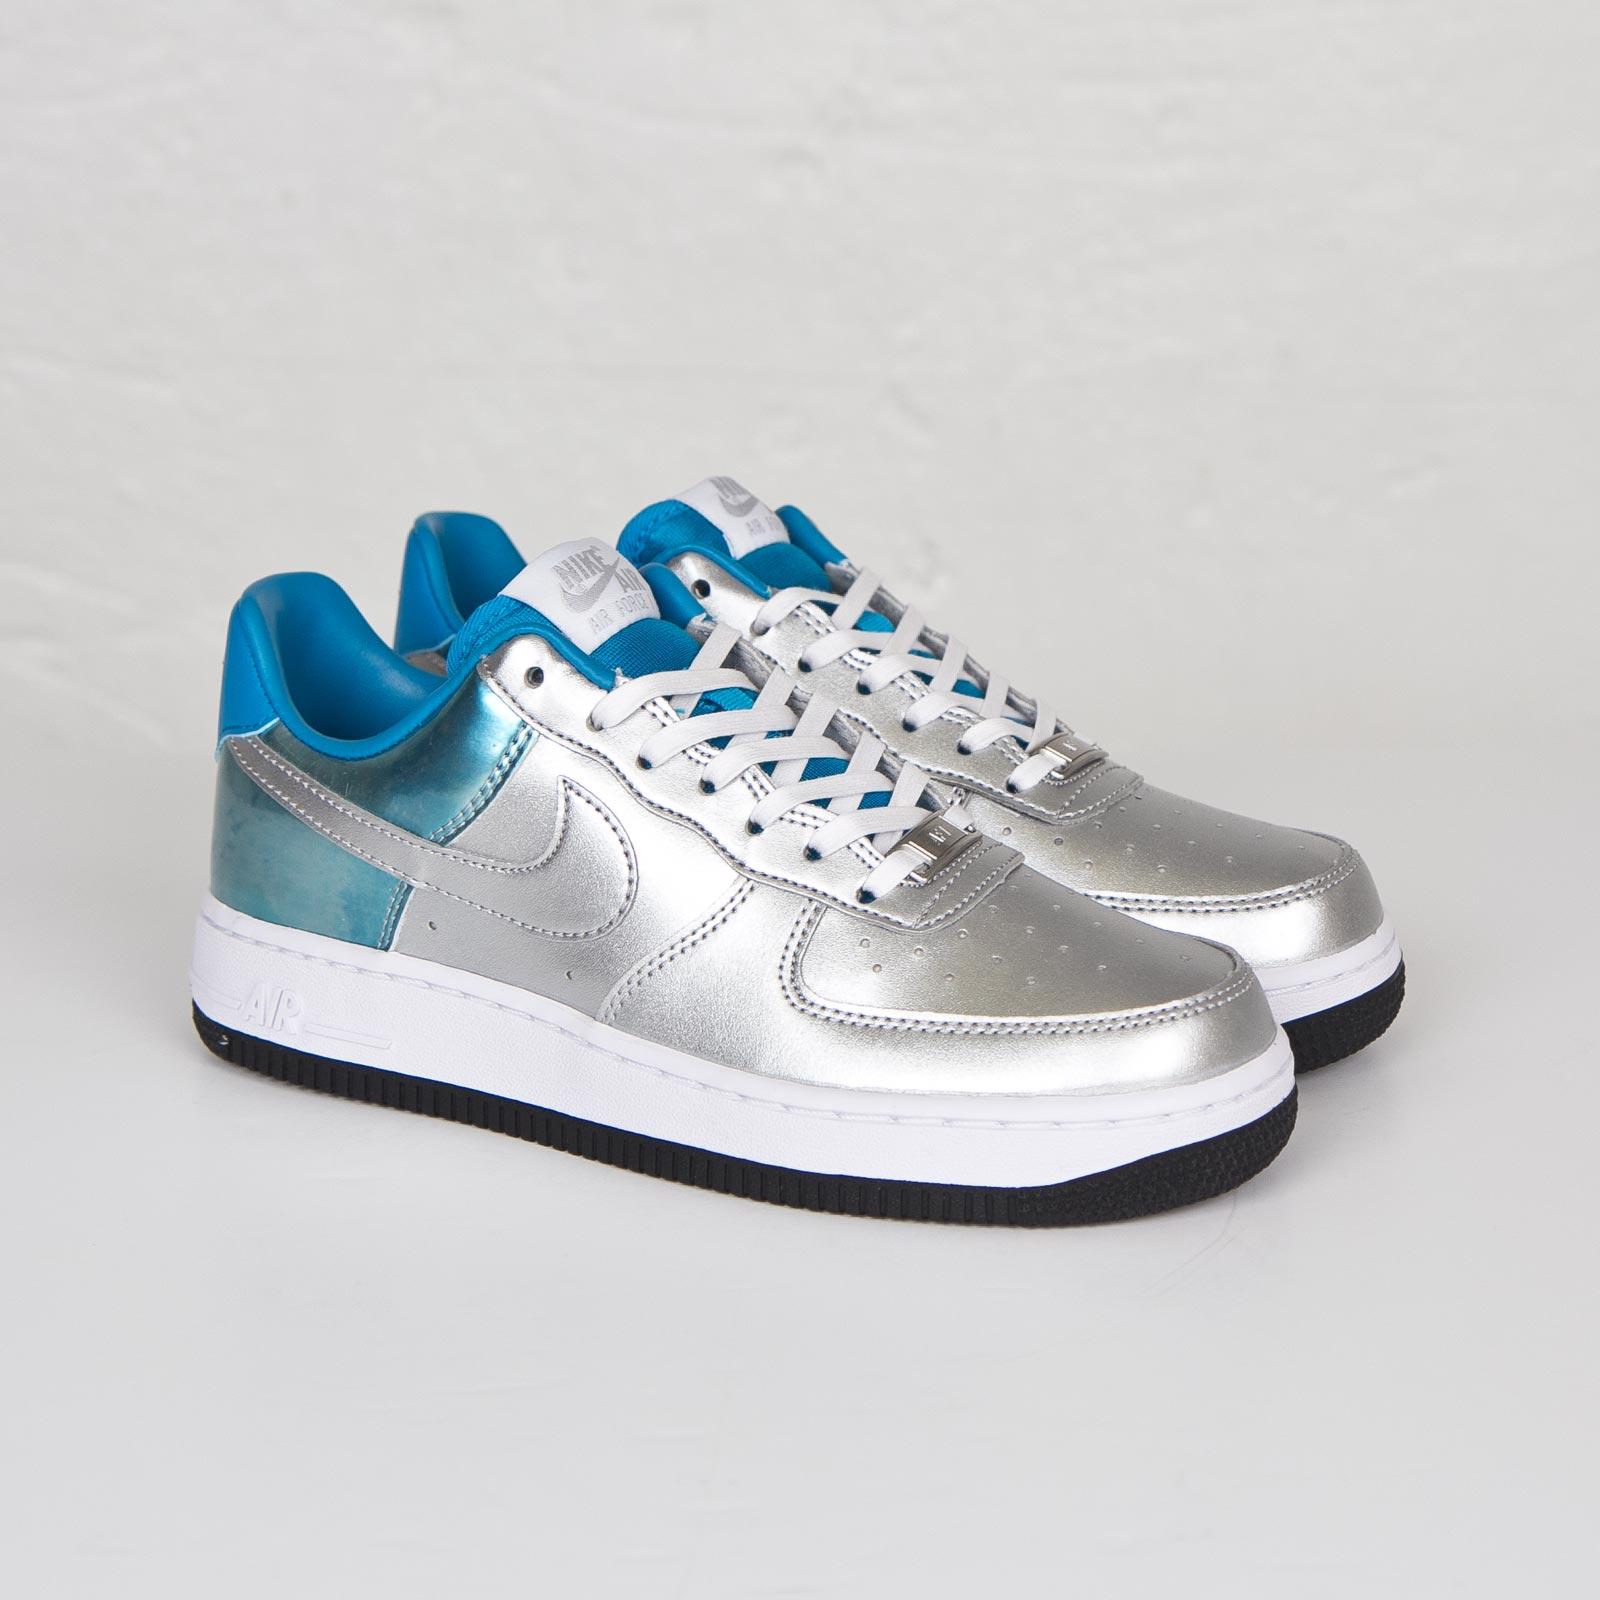 online retailer 8b4ed d1baf Nike Wmns Air Force 1 07 Premium QS